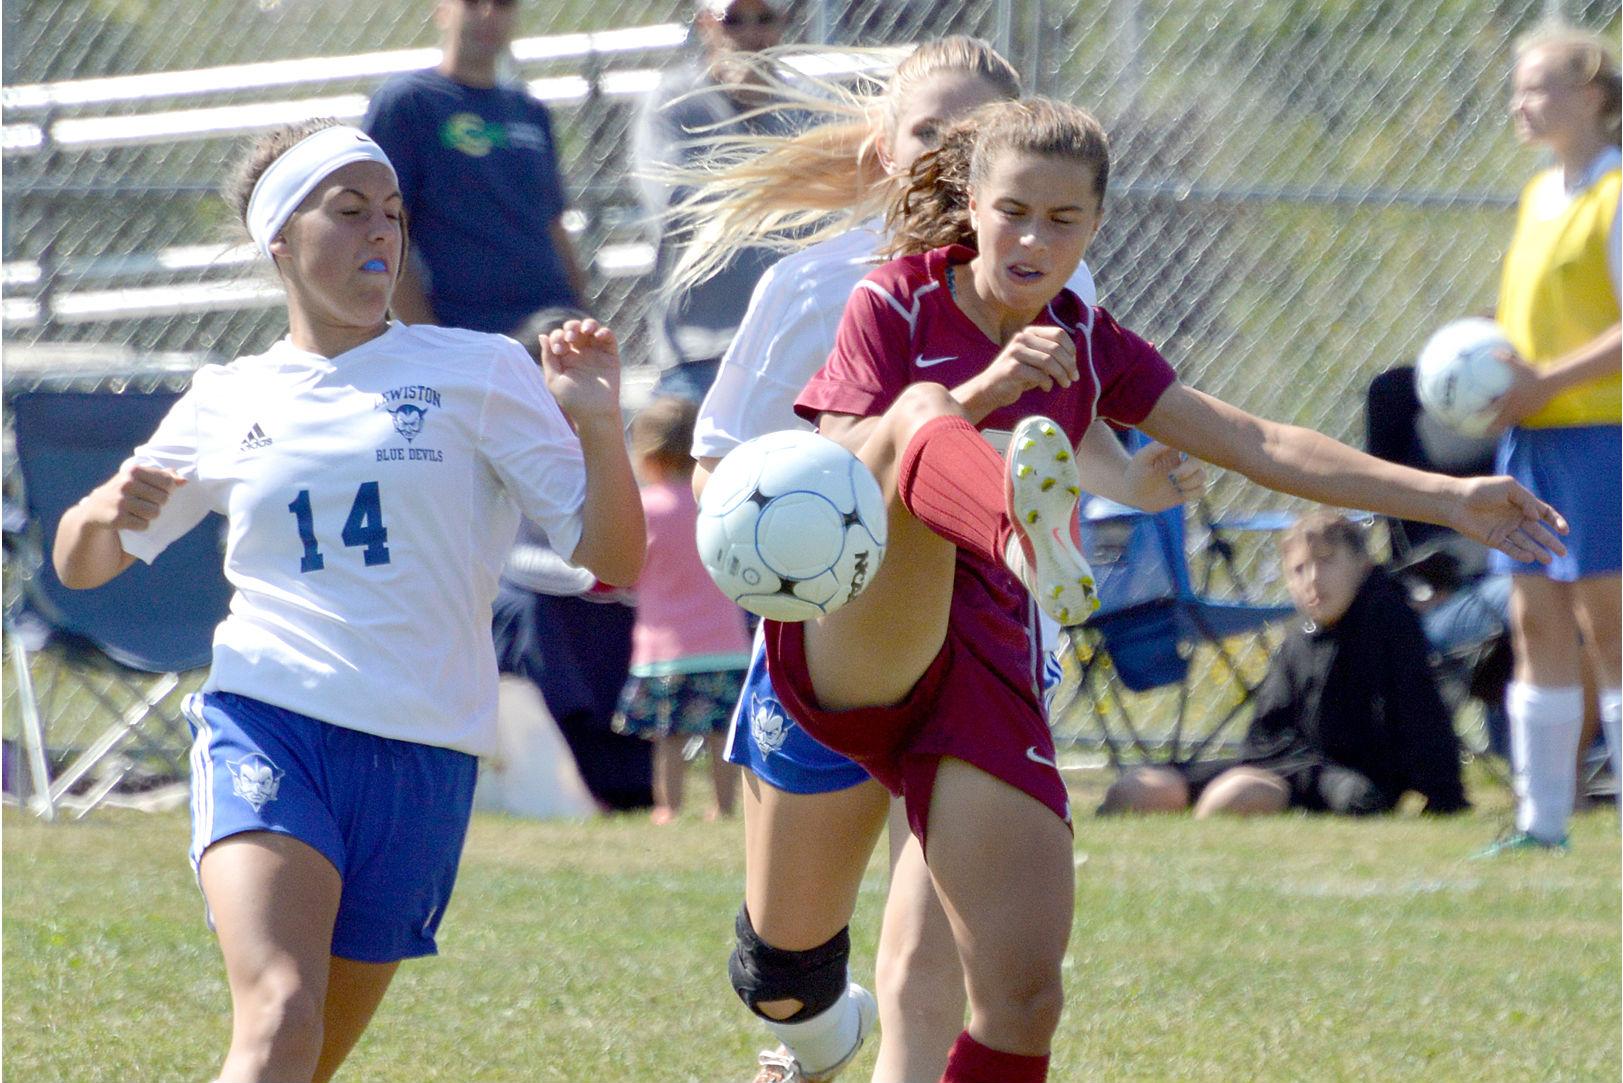 cf733d790c9 Bangor High loses standout midfielder to US Soccer — High School ...